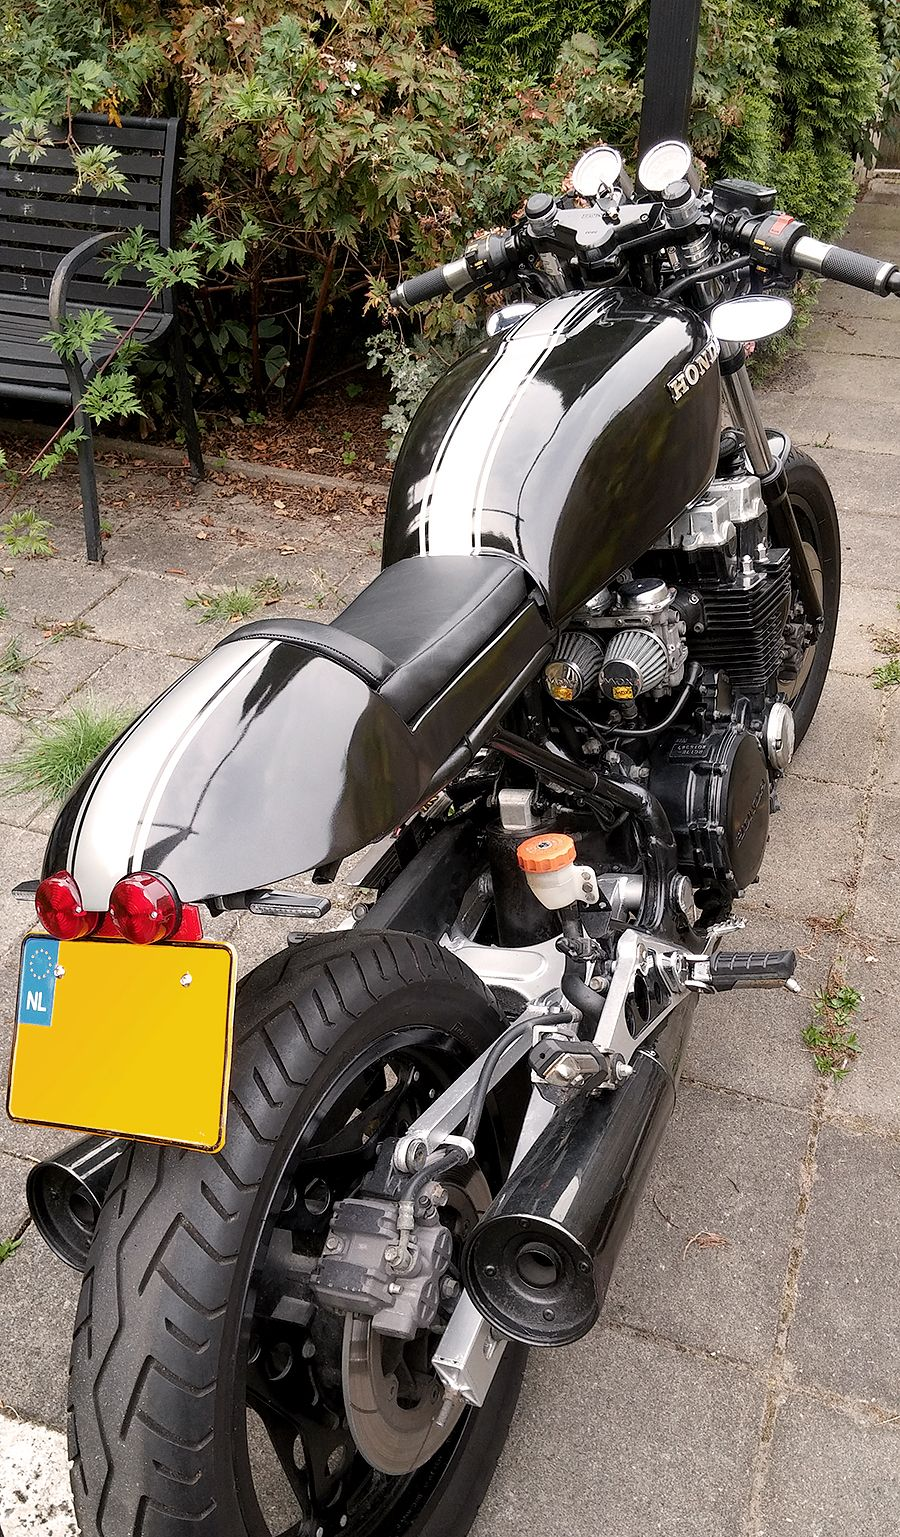 Honda CBX 750F 1988. Cafe Racer 2016. Air/oil cooled